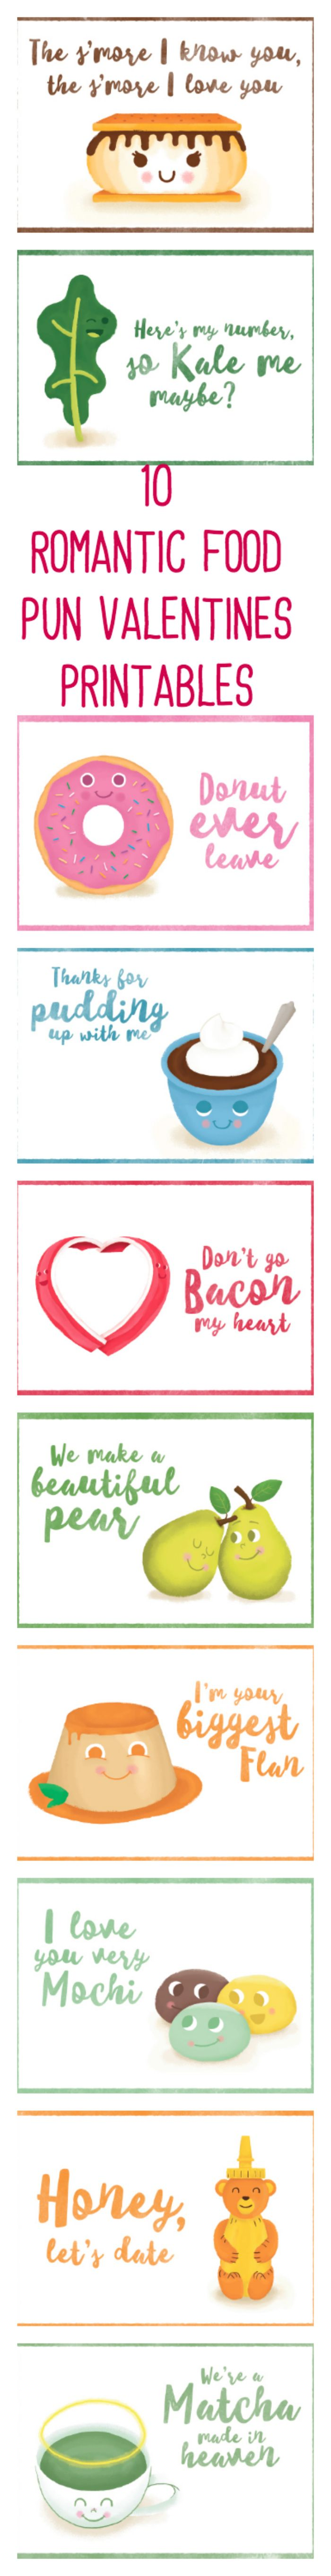 10 Romantic Food Pun Valentines Printables